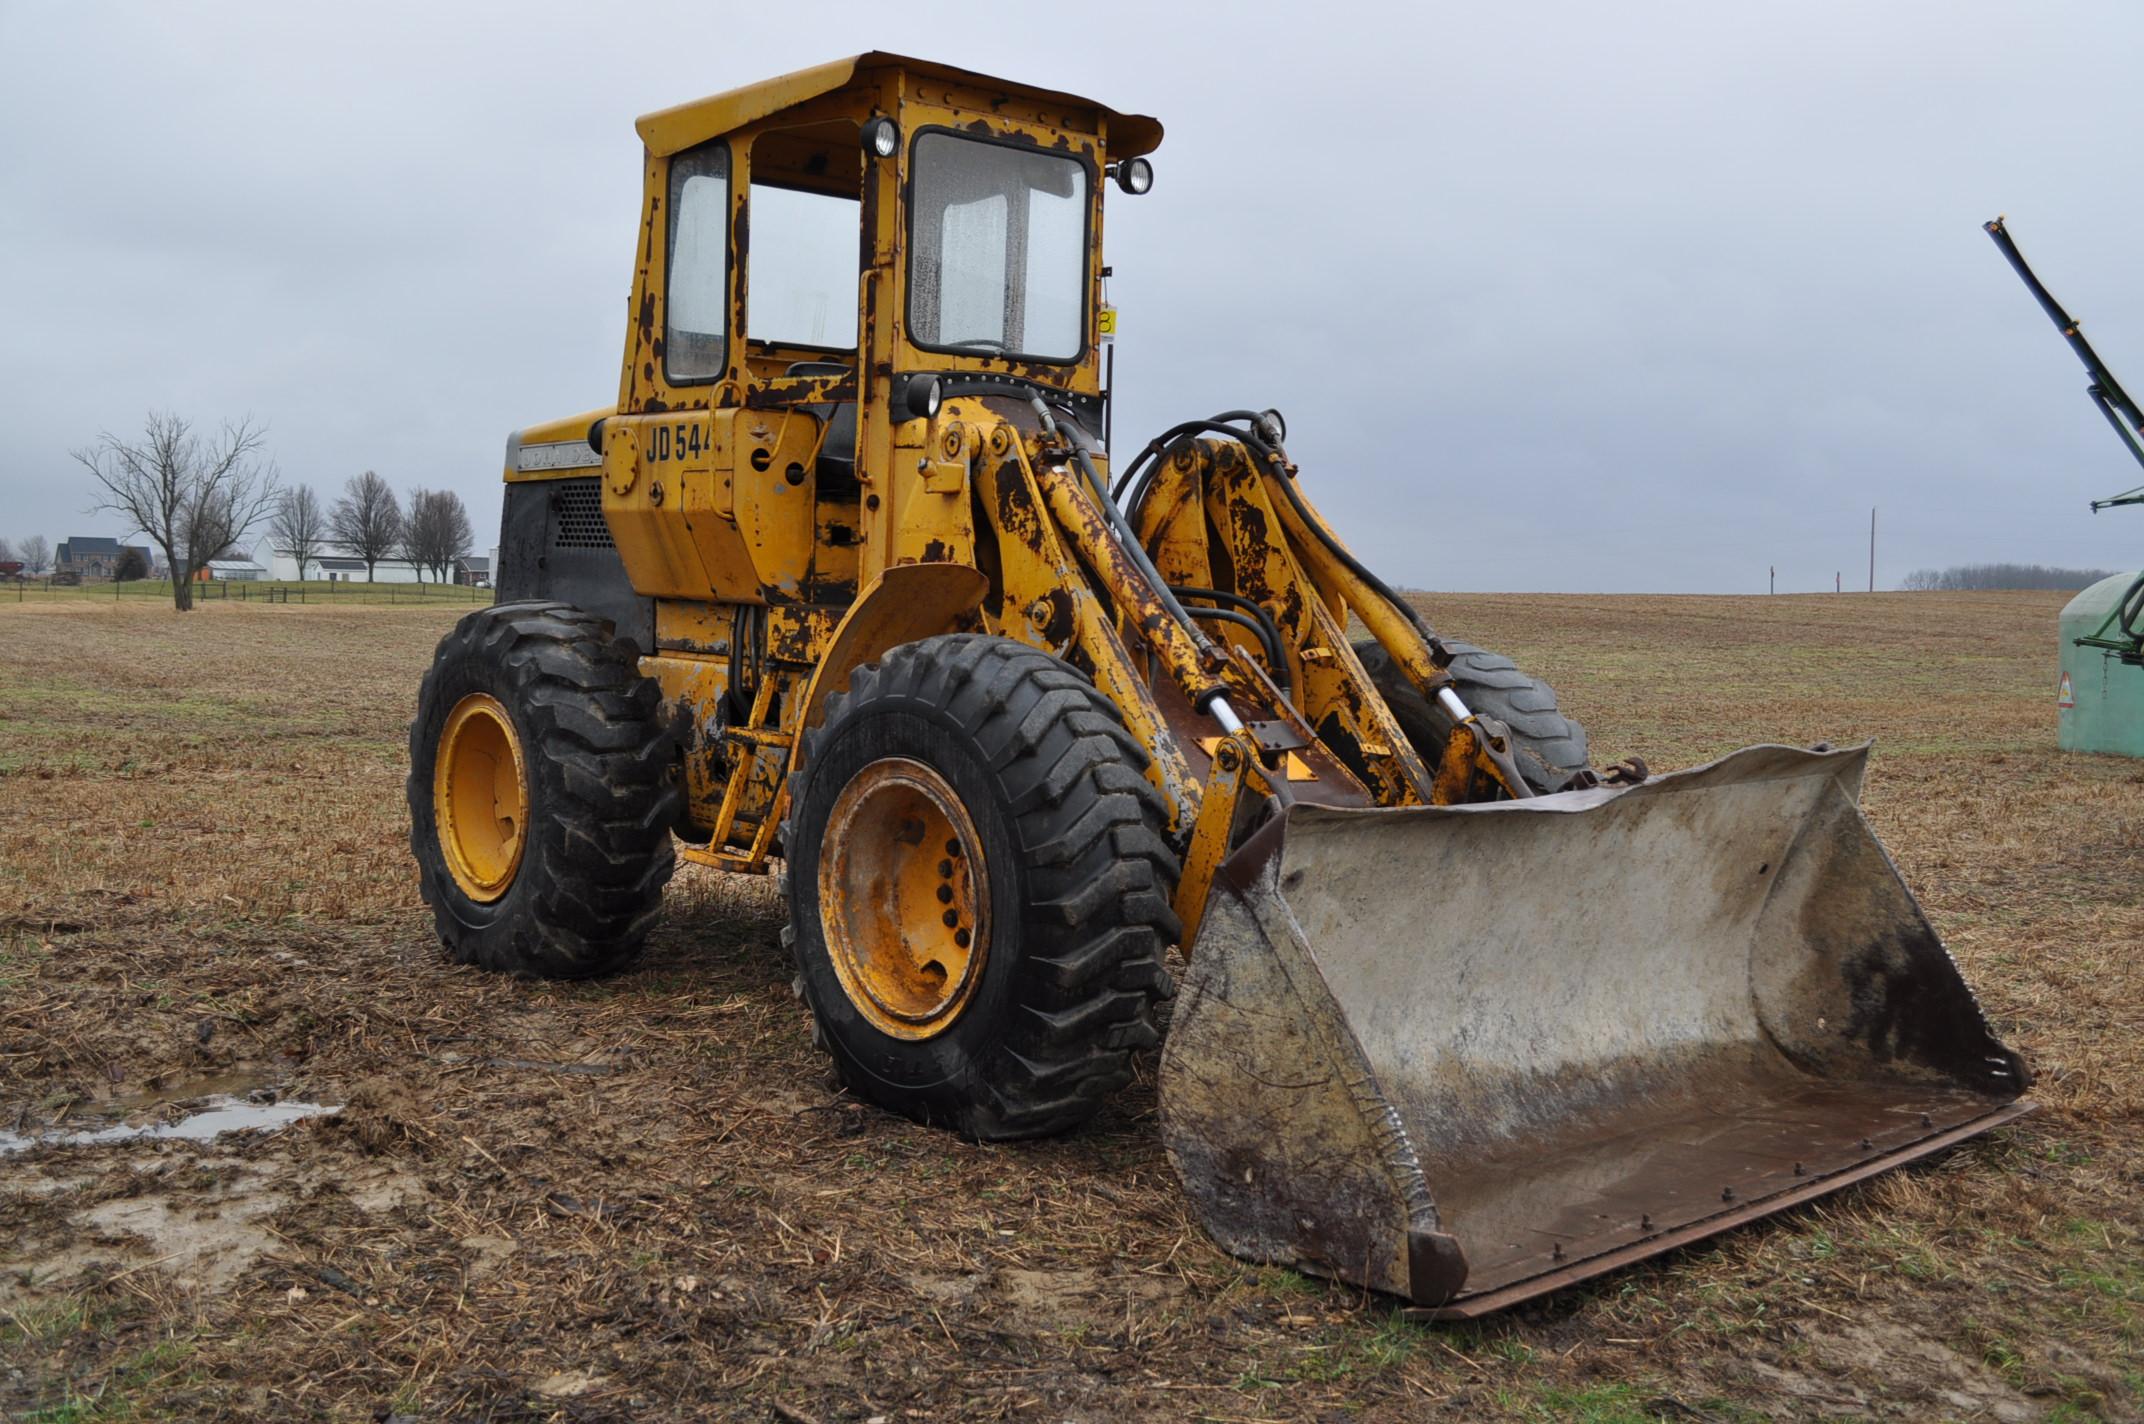 John Deere 544 Payloader, 17.5-25 tires, shows 1074 hrs, SN 0767621 - Image 4 of 16